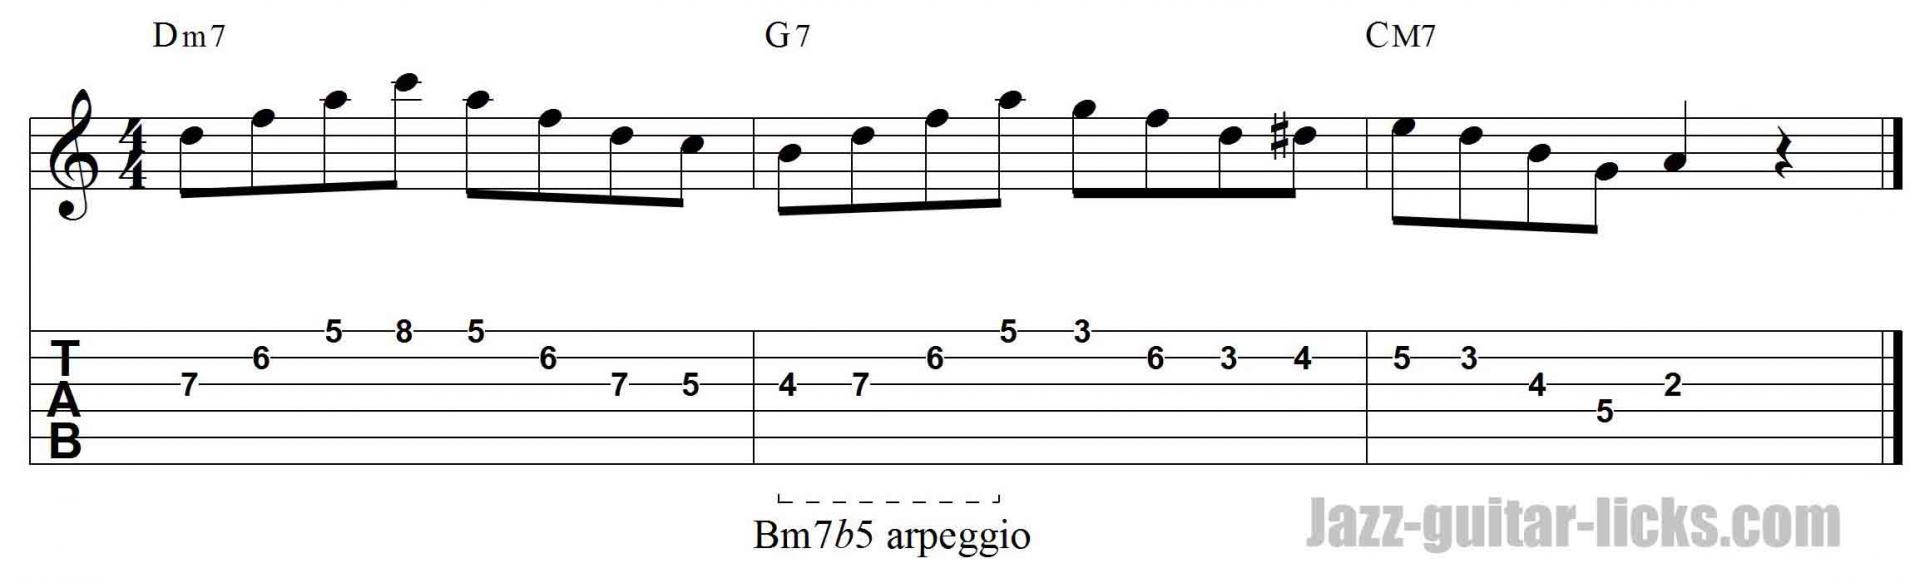 m7b5 arpeggio jazz guiatr lick w/ tab 2